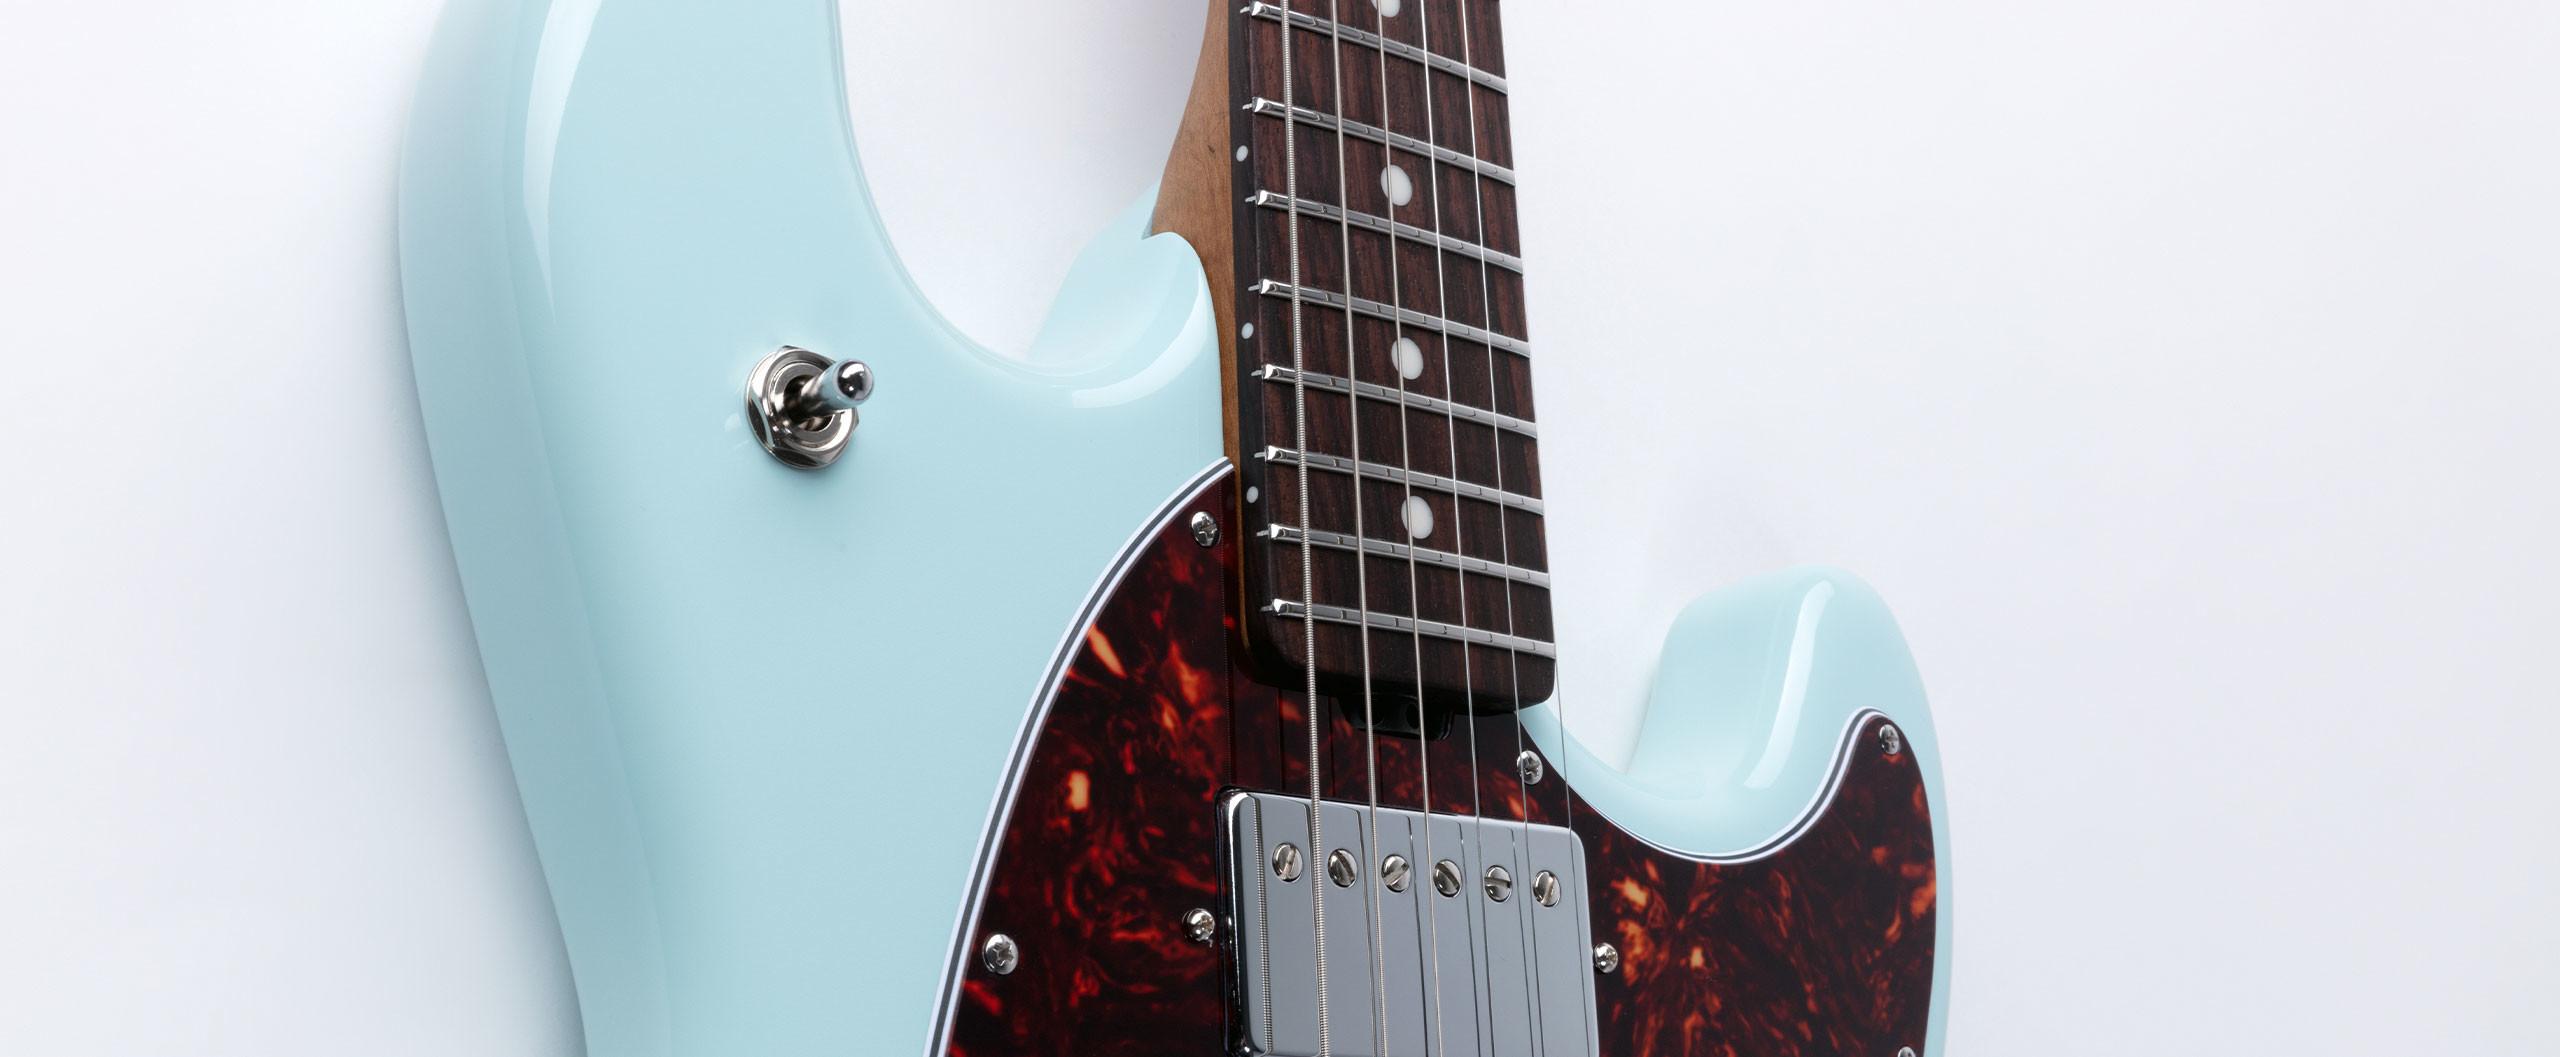 StingRay RS Guitar Guitars